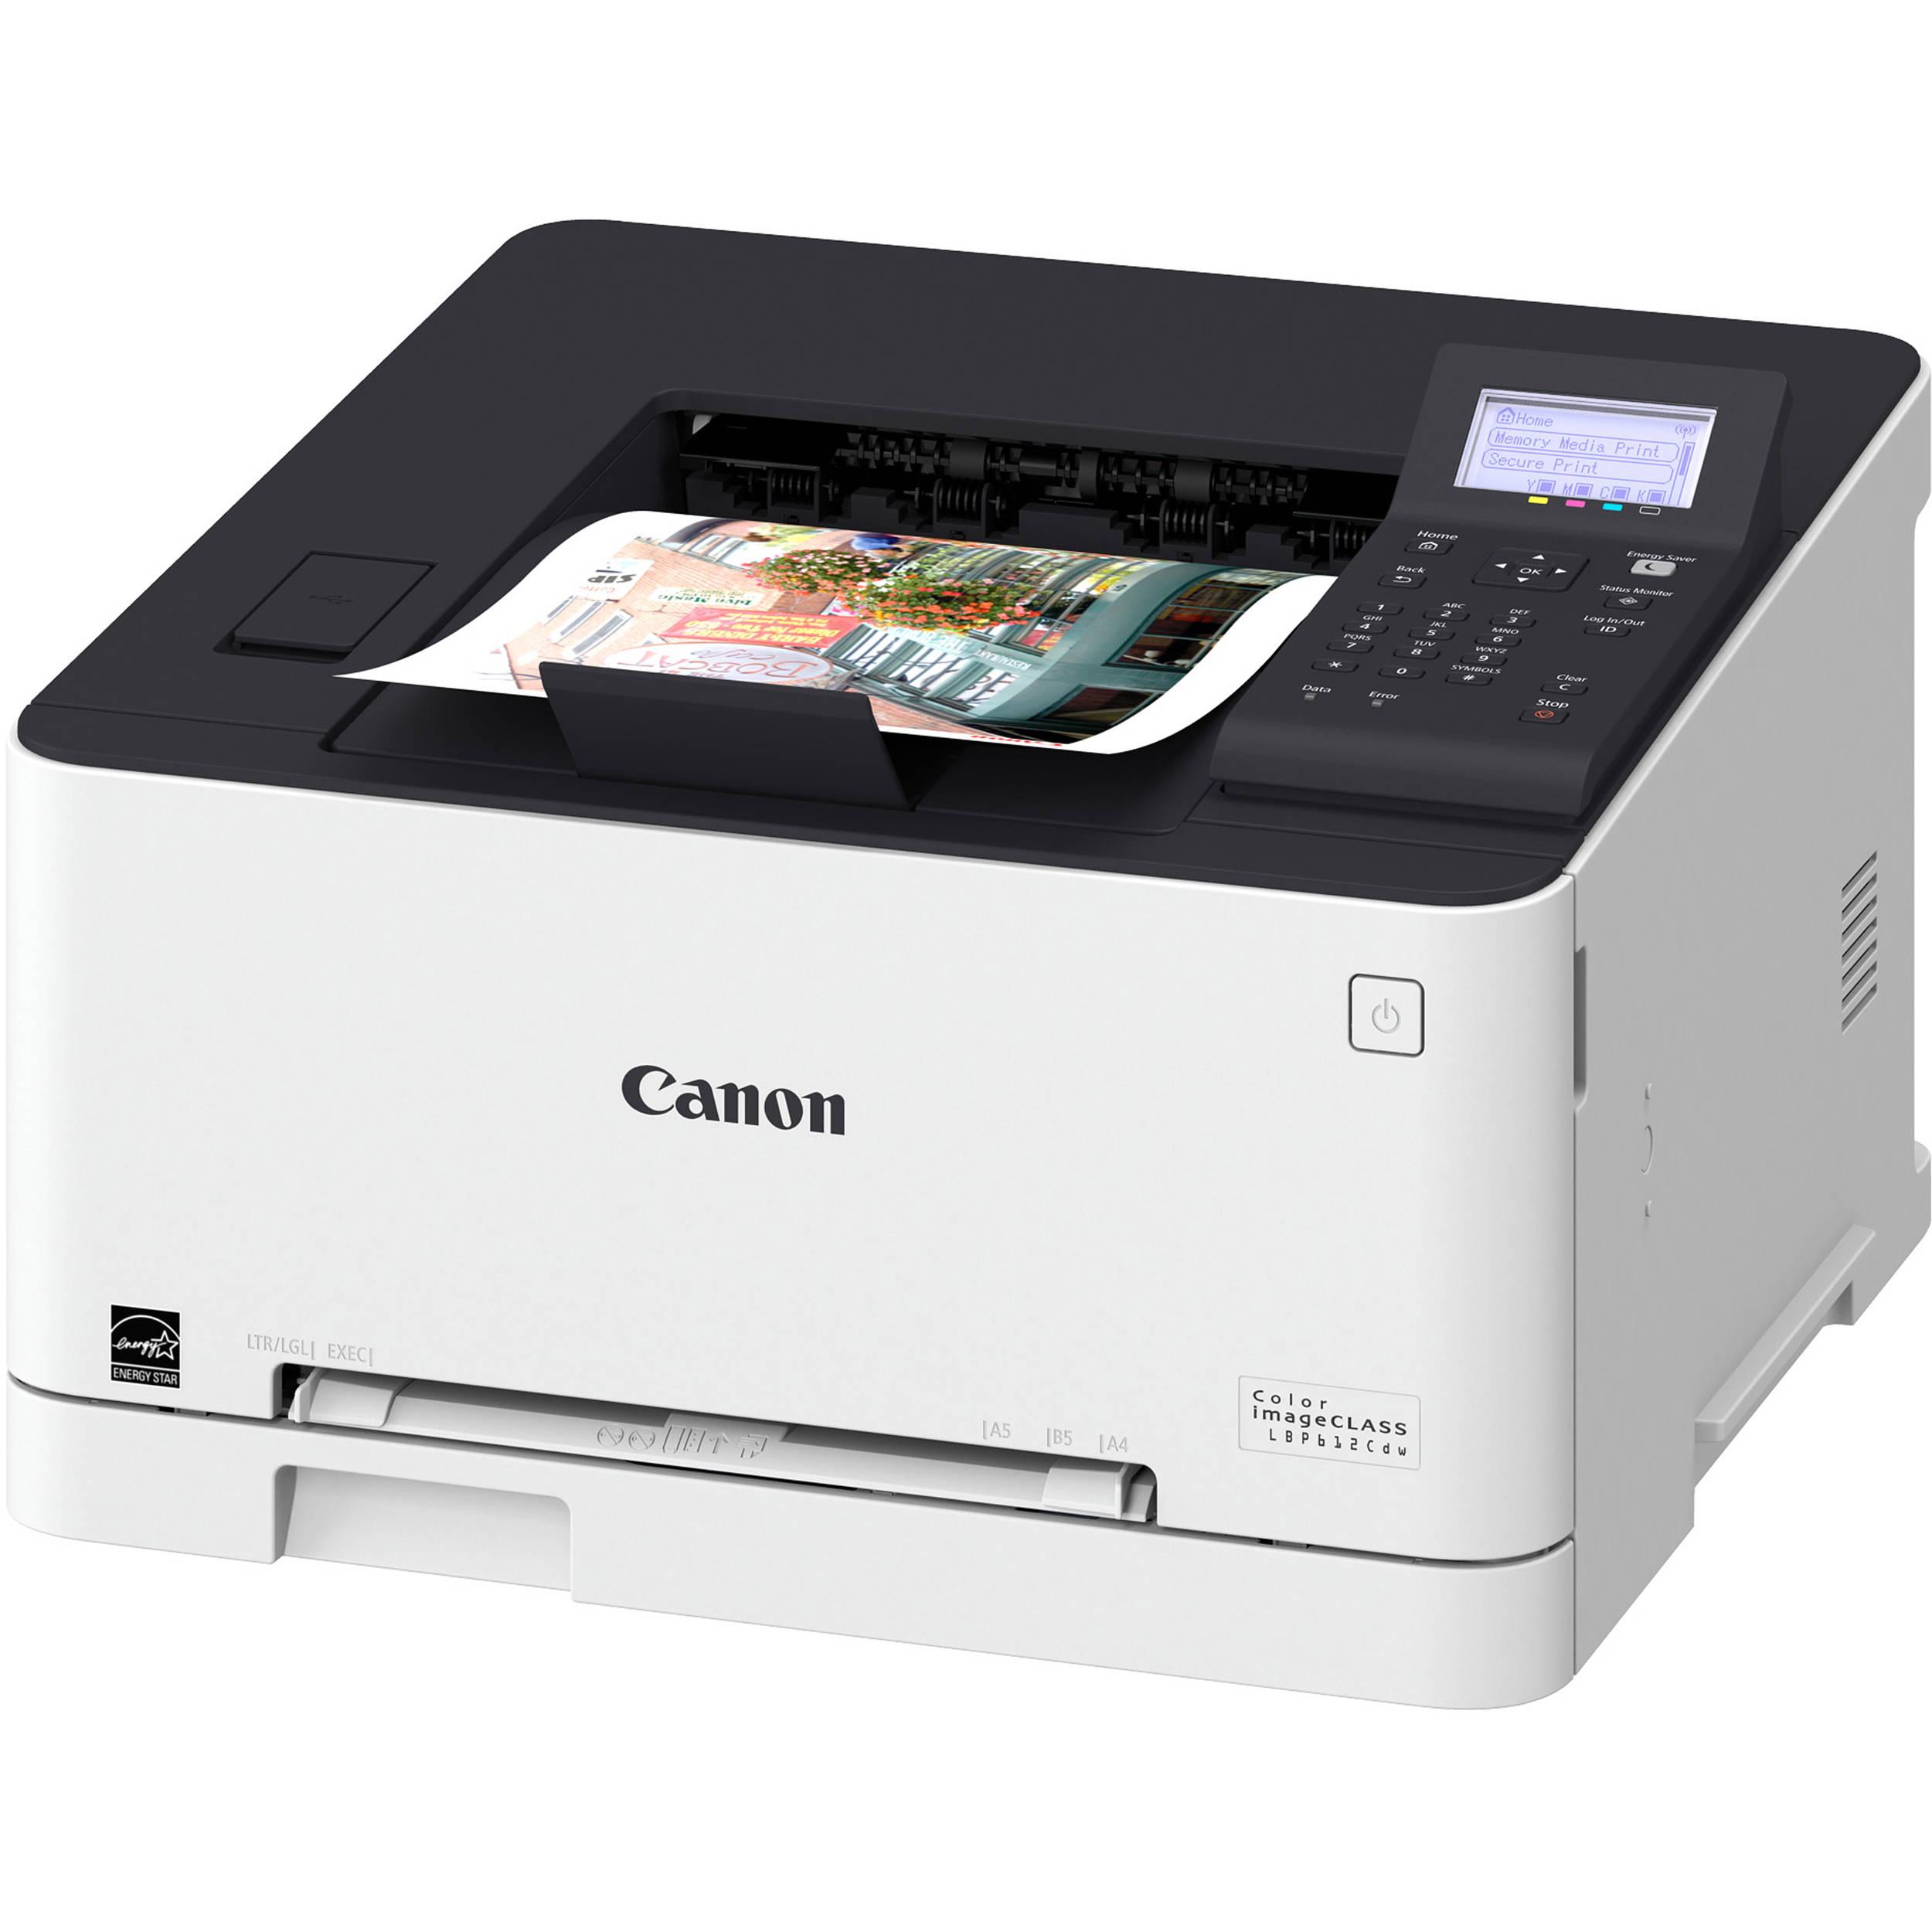 8a050179 Inkntoneruk Blog | The latest news on printers, printer technology ...